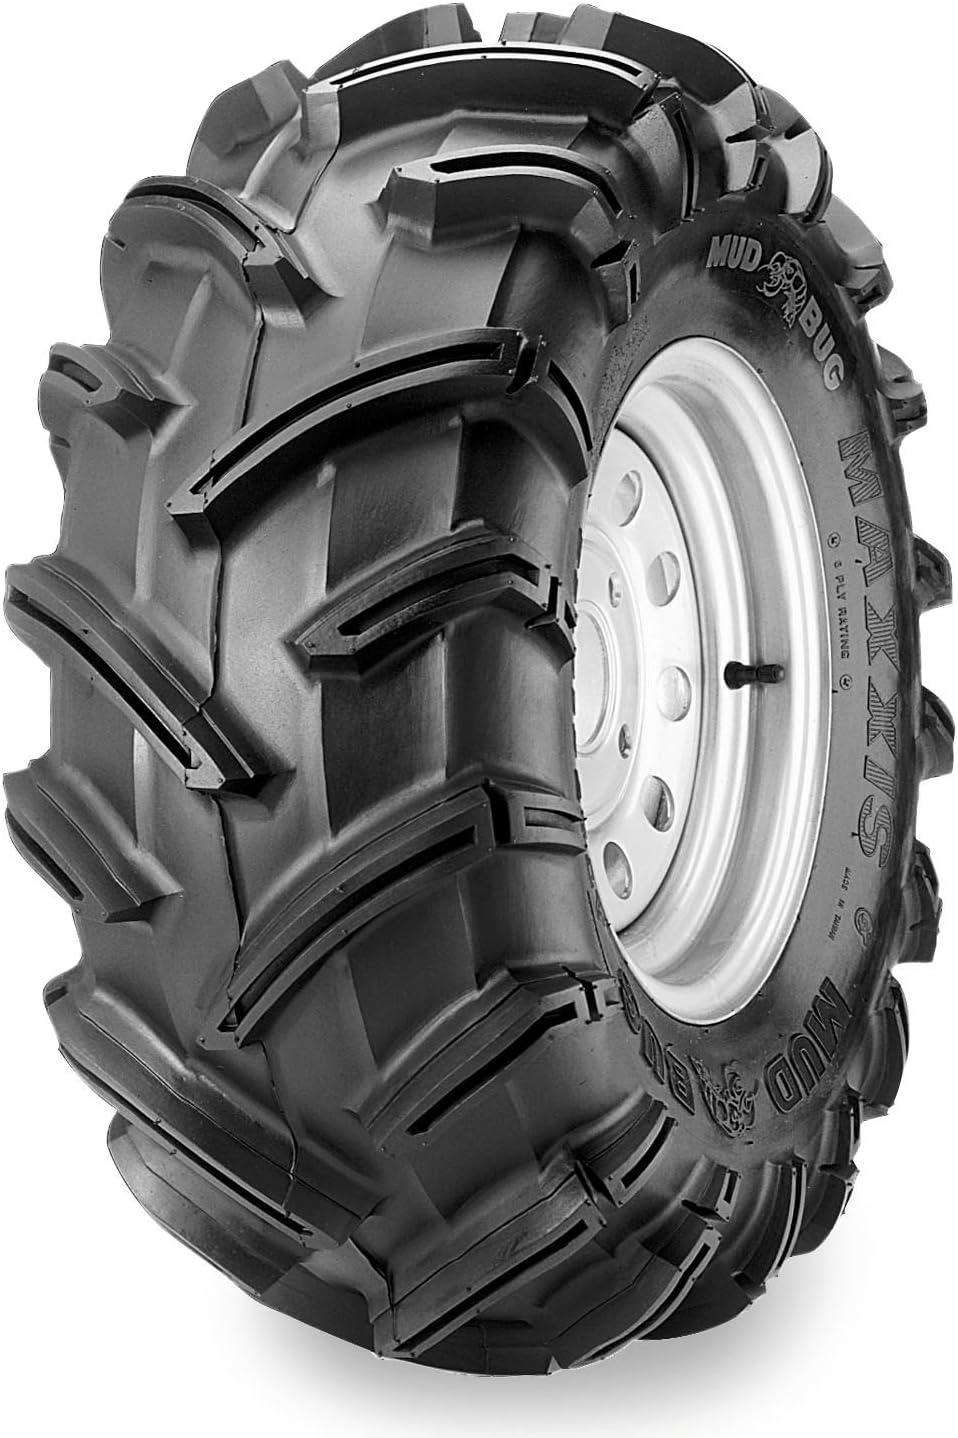 Position: Rear Tire Type: ATV//UTV Rear Tire Ply: 6 Tire Construction: Bias Maxxis MU02 Zilla Tire Tire Application: Mud//Snow TM00153100 Tire Size: 28x12x12 28x12x12 Rim Size: 12